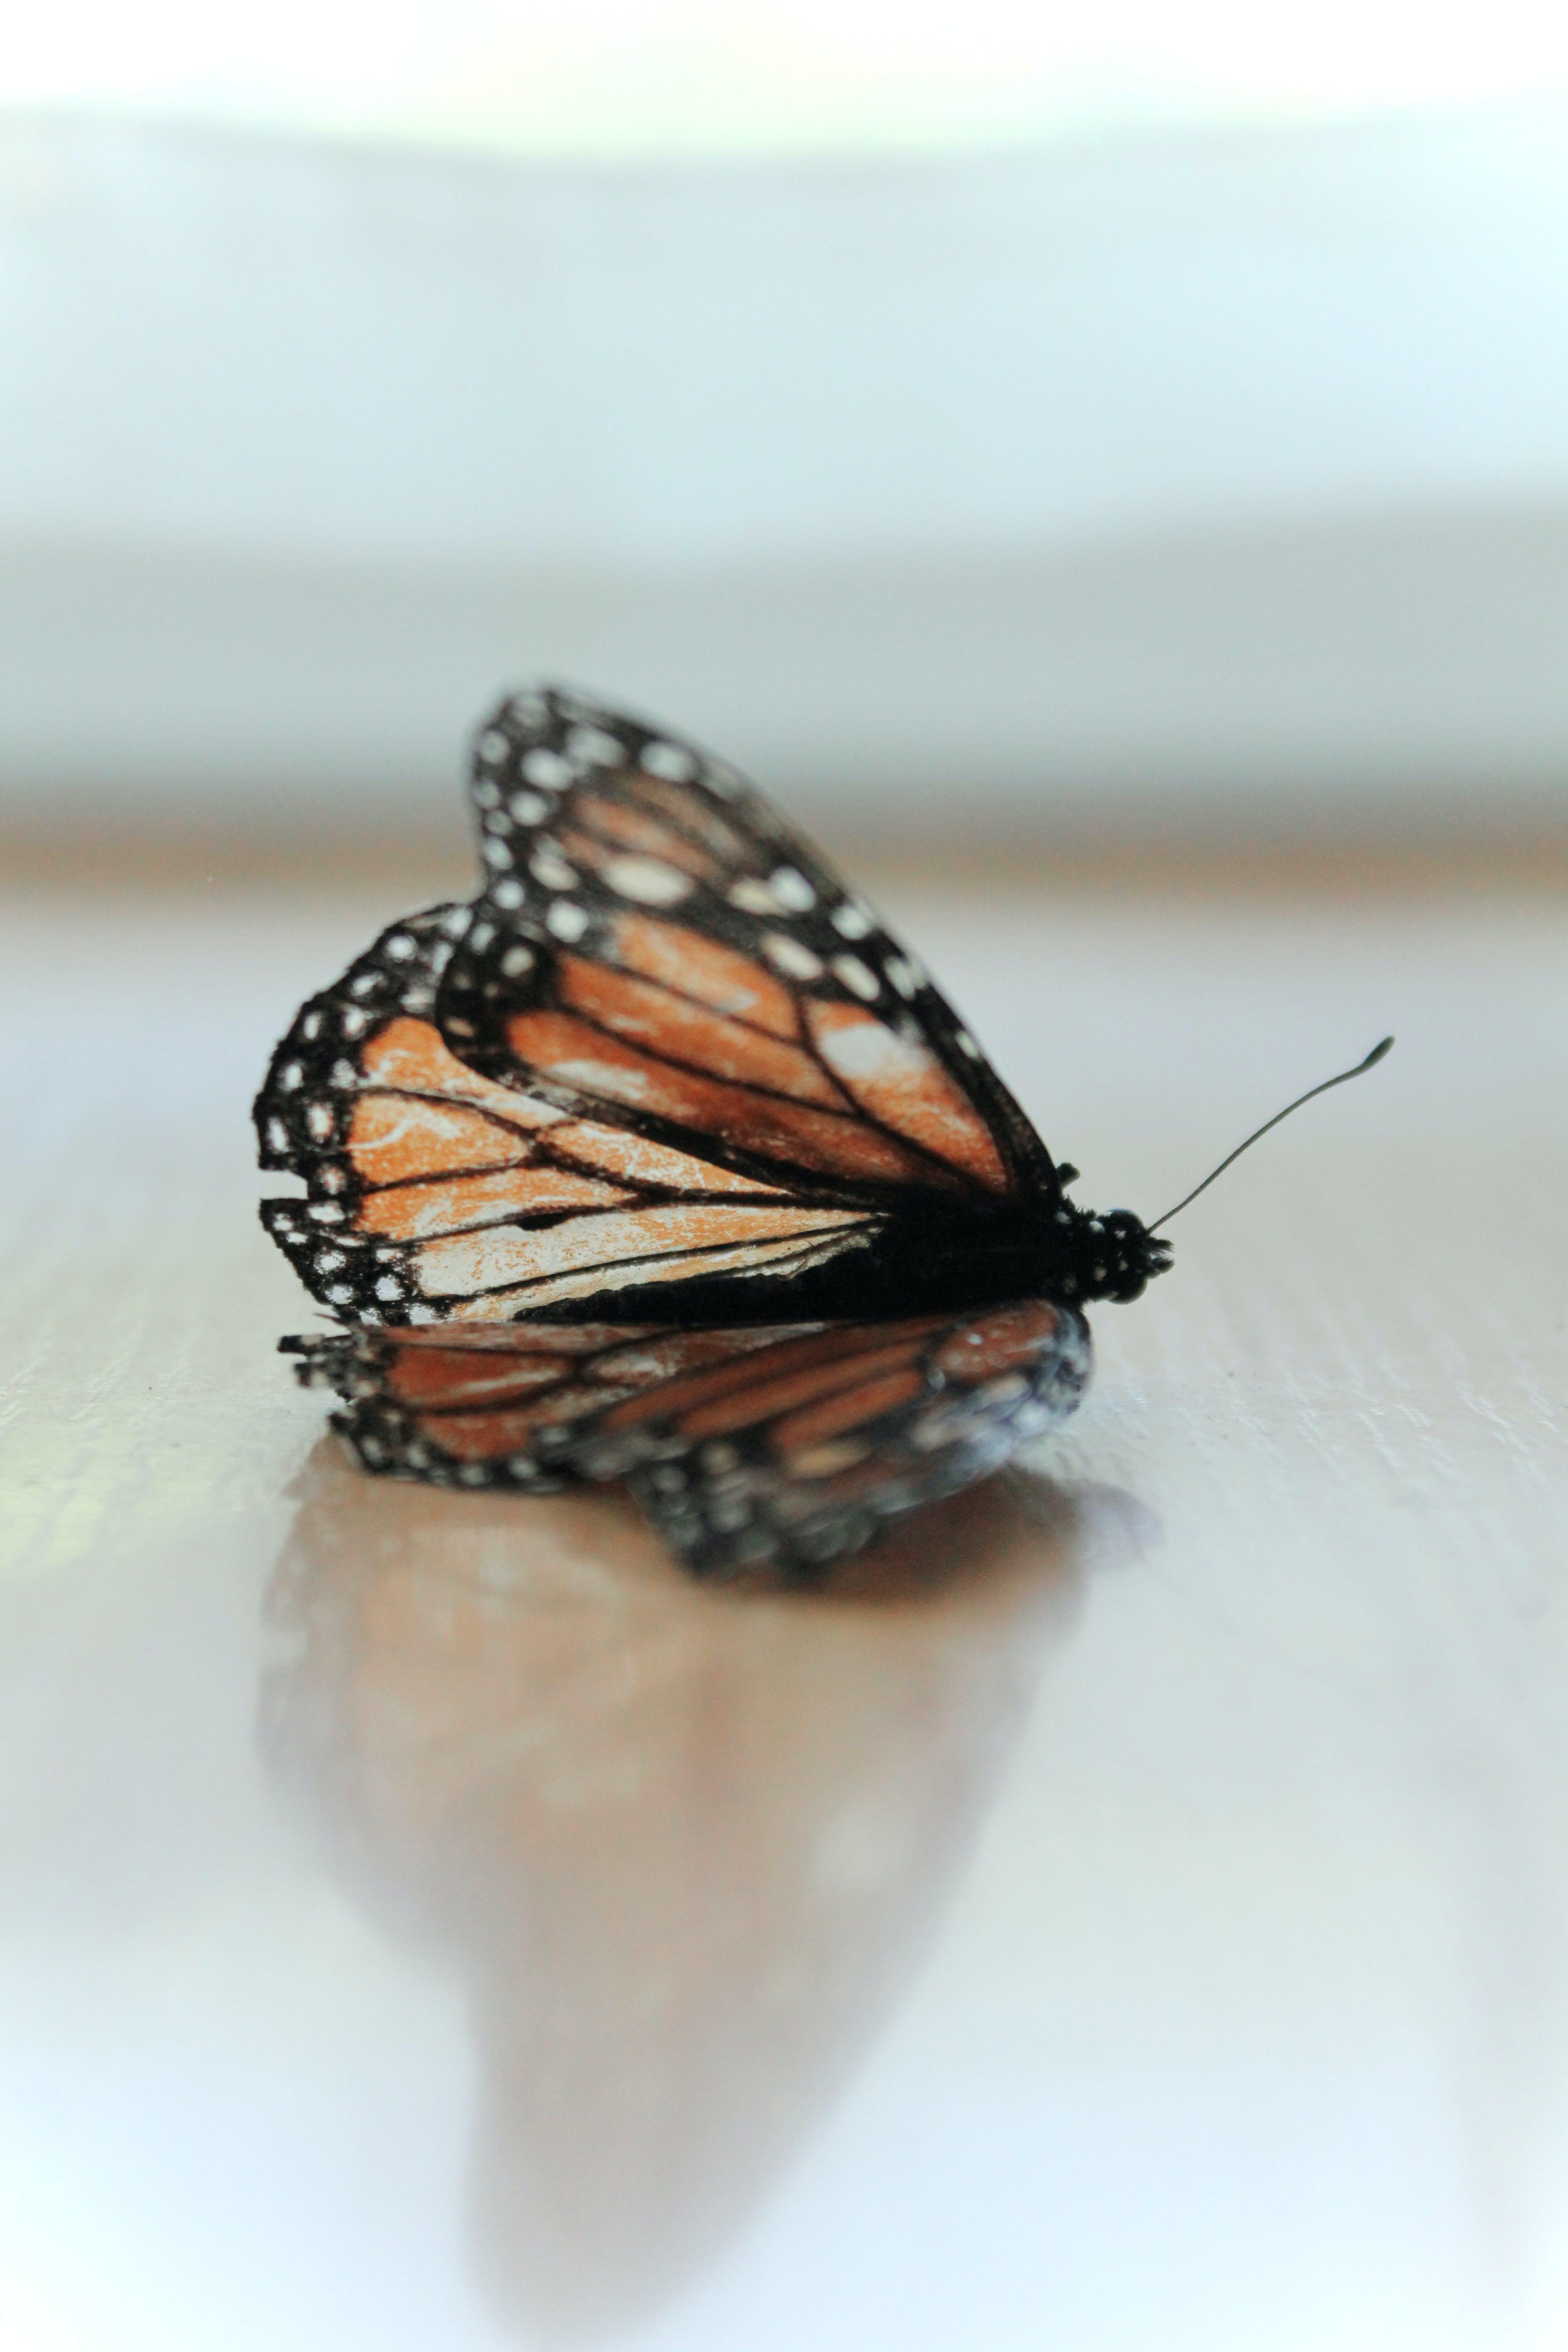 biologie, entomologie, farben